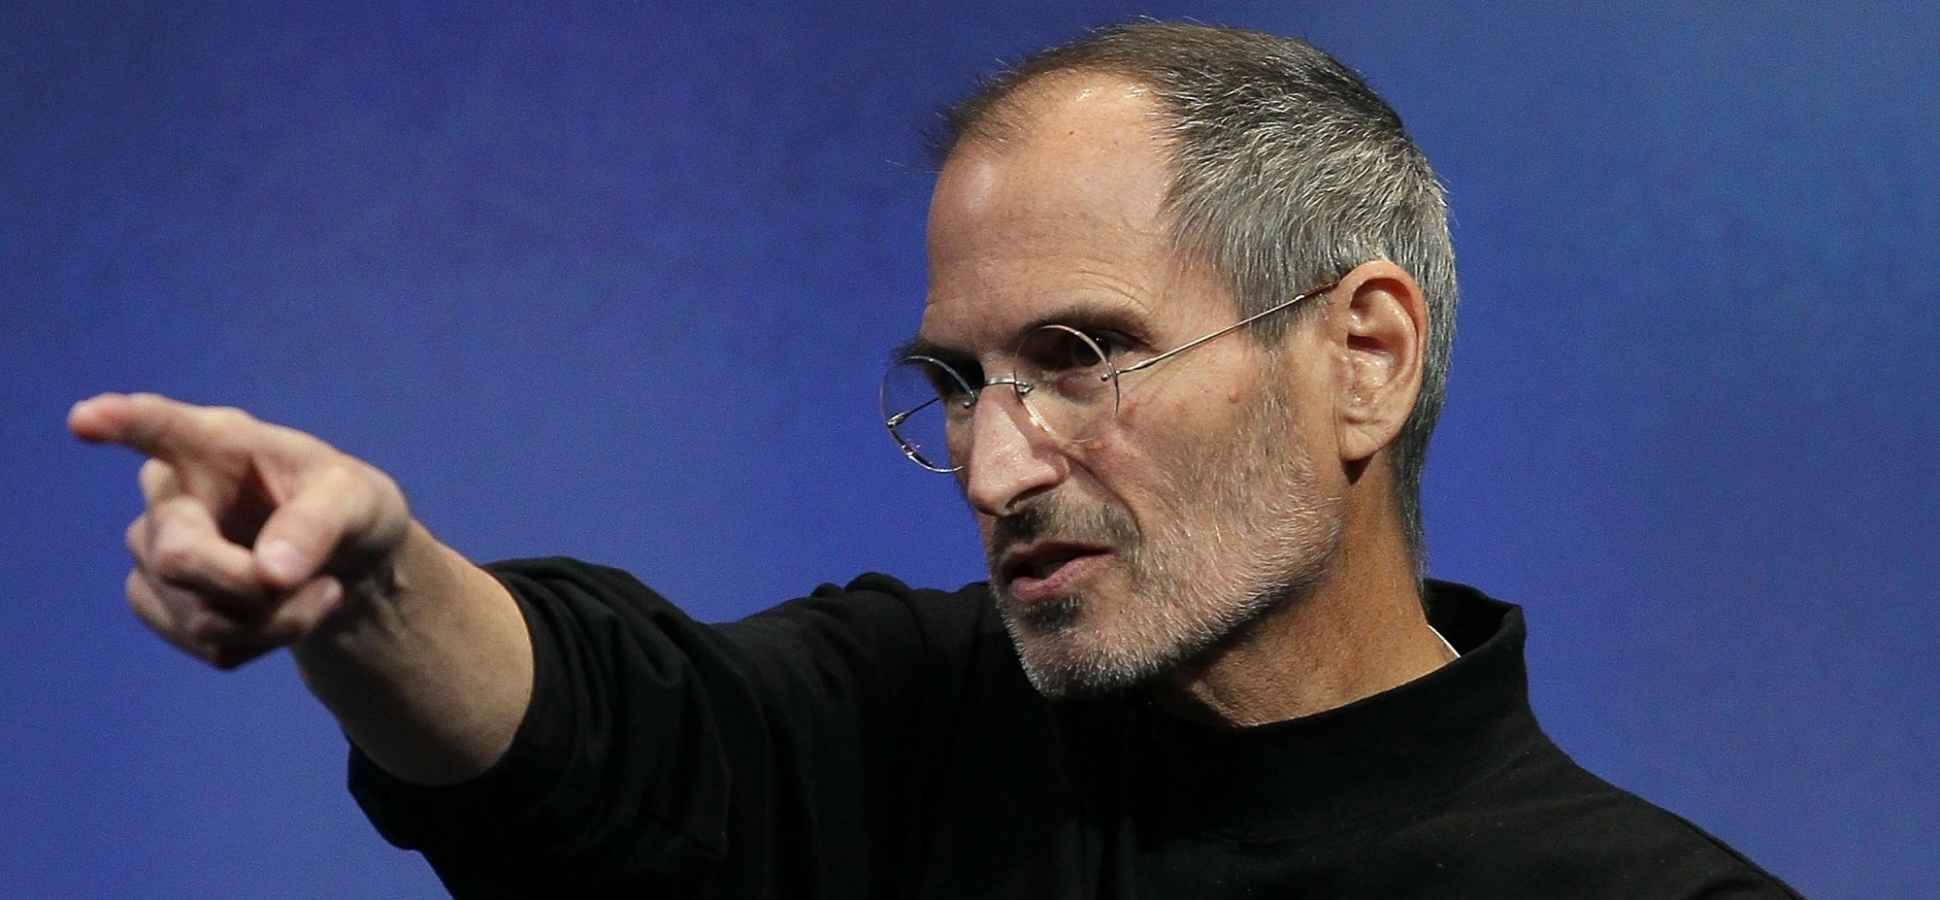 Guy Kawasaki's Most Memorable Steve Jobs Moment